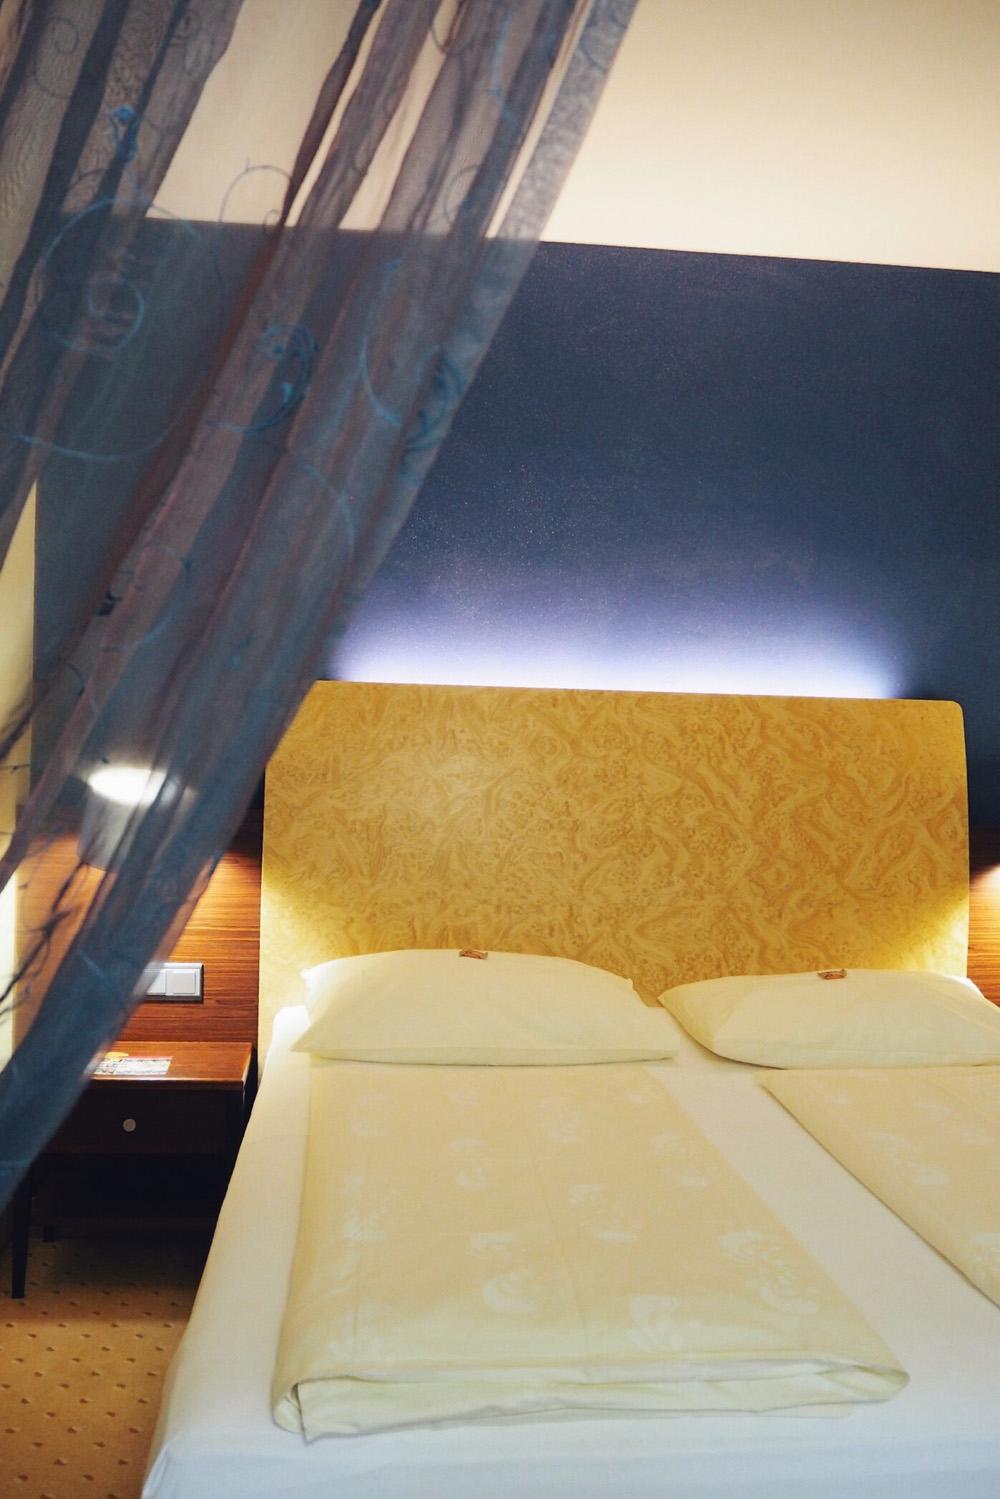 Weekend-Getaway-Hotel-Paradiso-EurothermenResort-Bad-Schallerbach-Suechtig-nach-Lifestyleblog-Fashionblog-Foodblog-Oberoesterreich-Linz-09